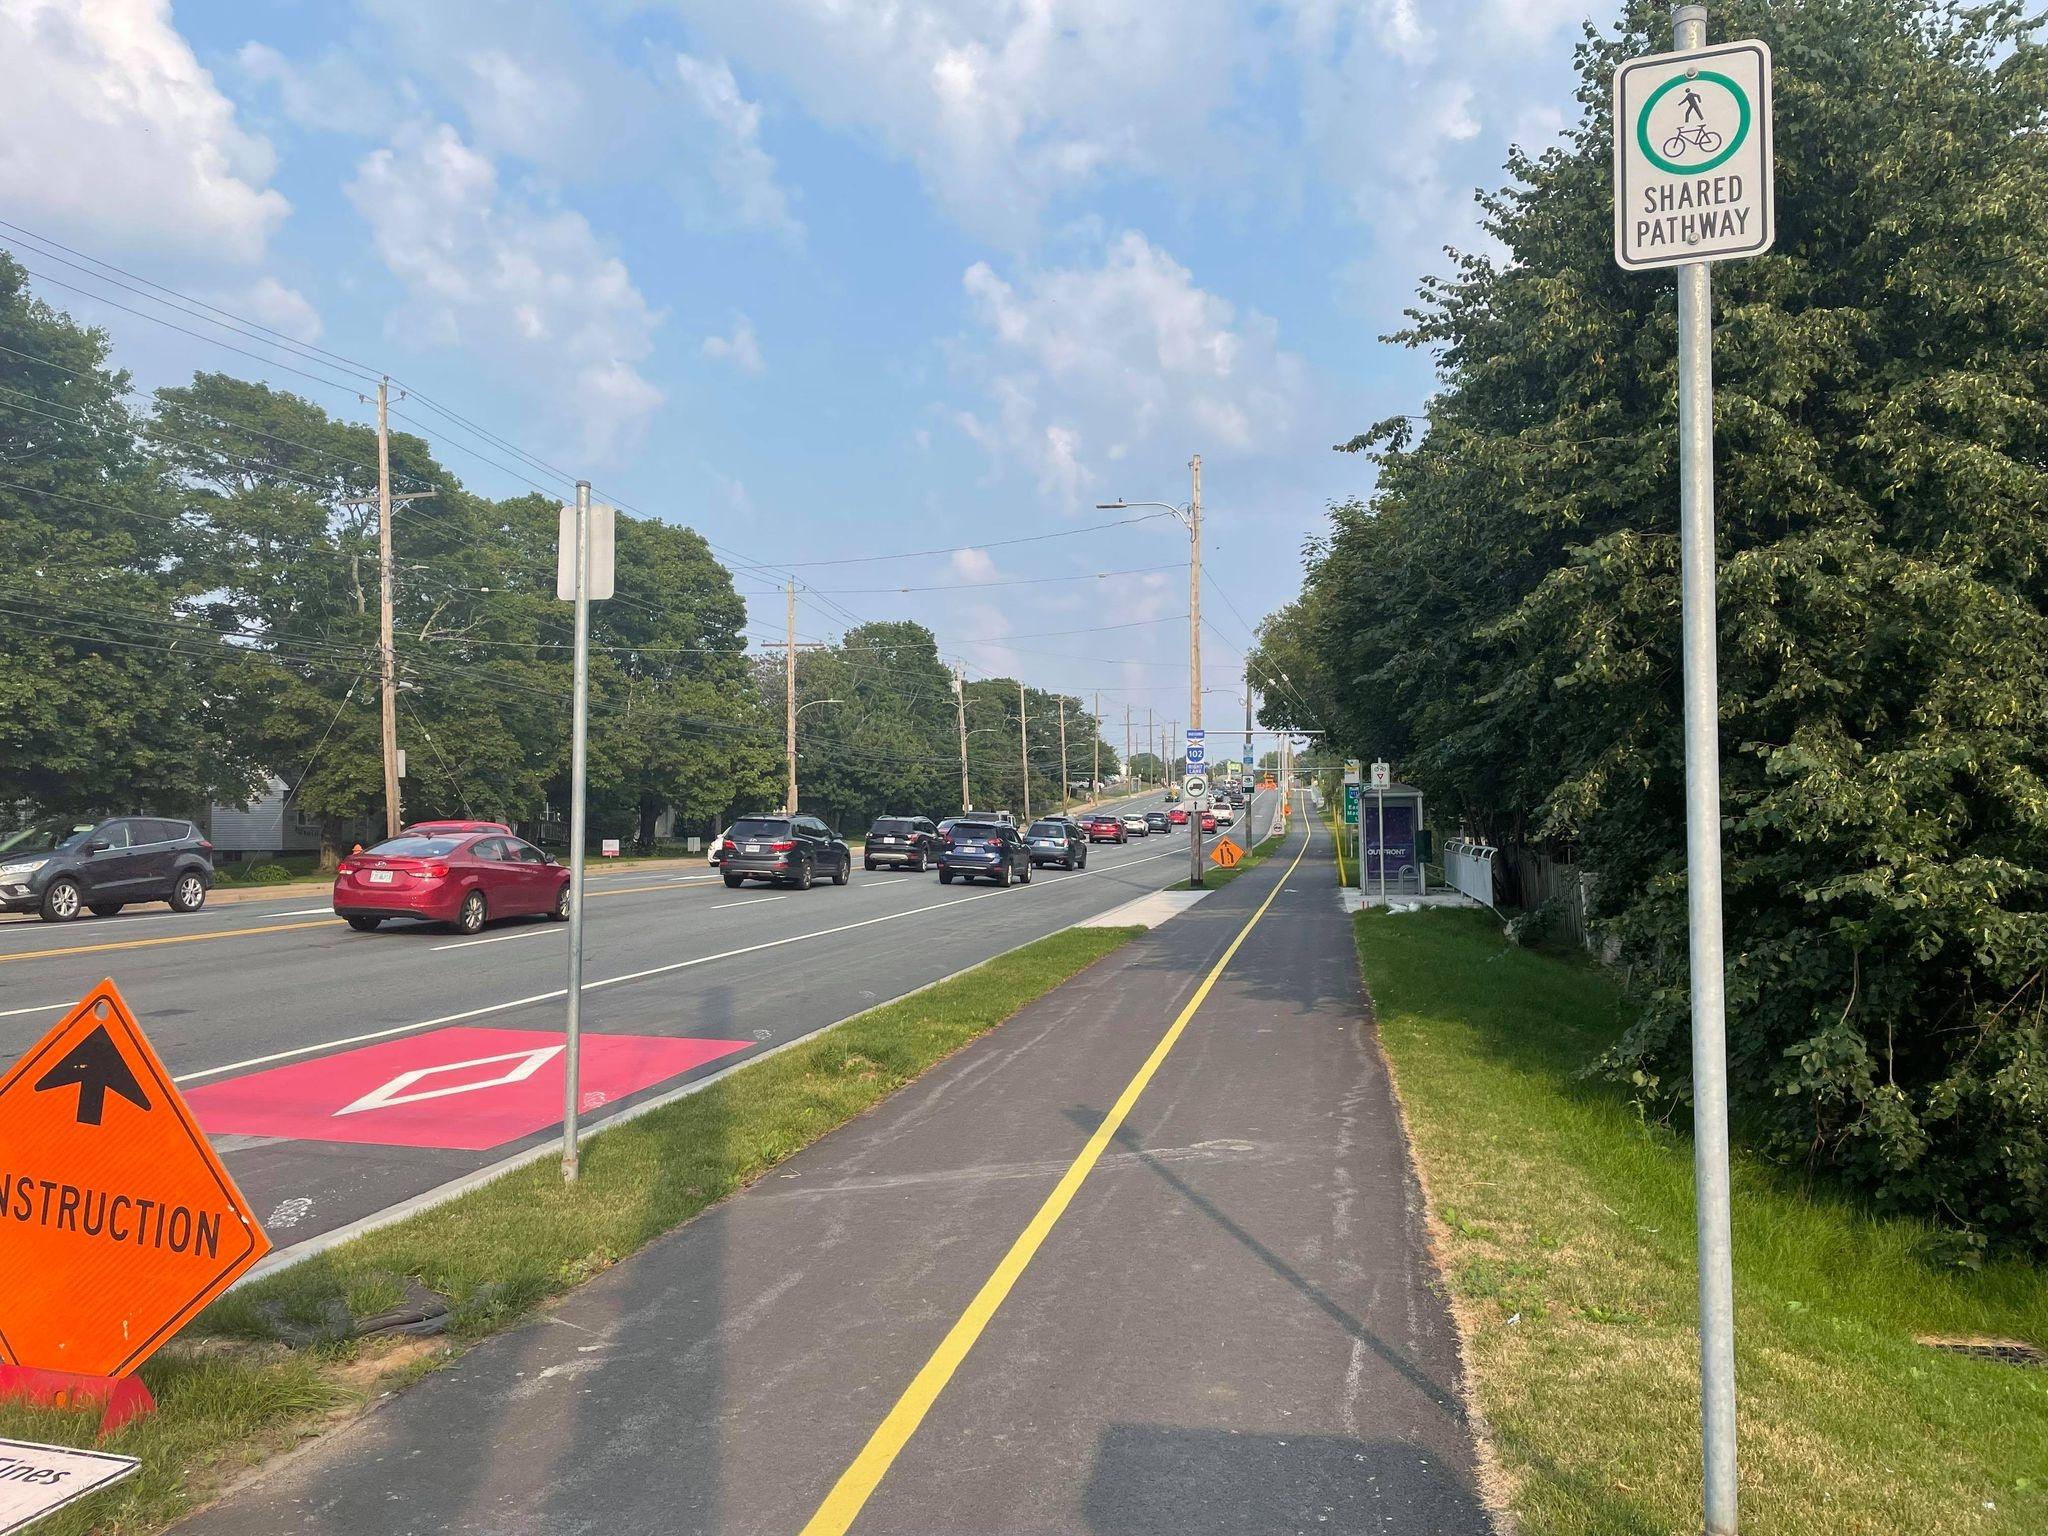 Shared pathway along Bayers Road looking toward Halifax Shopping Centre.